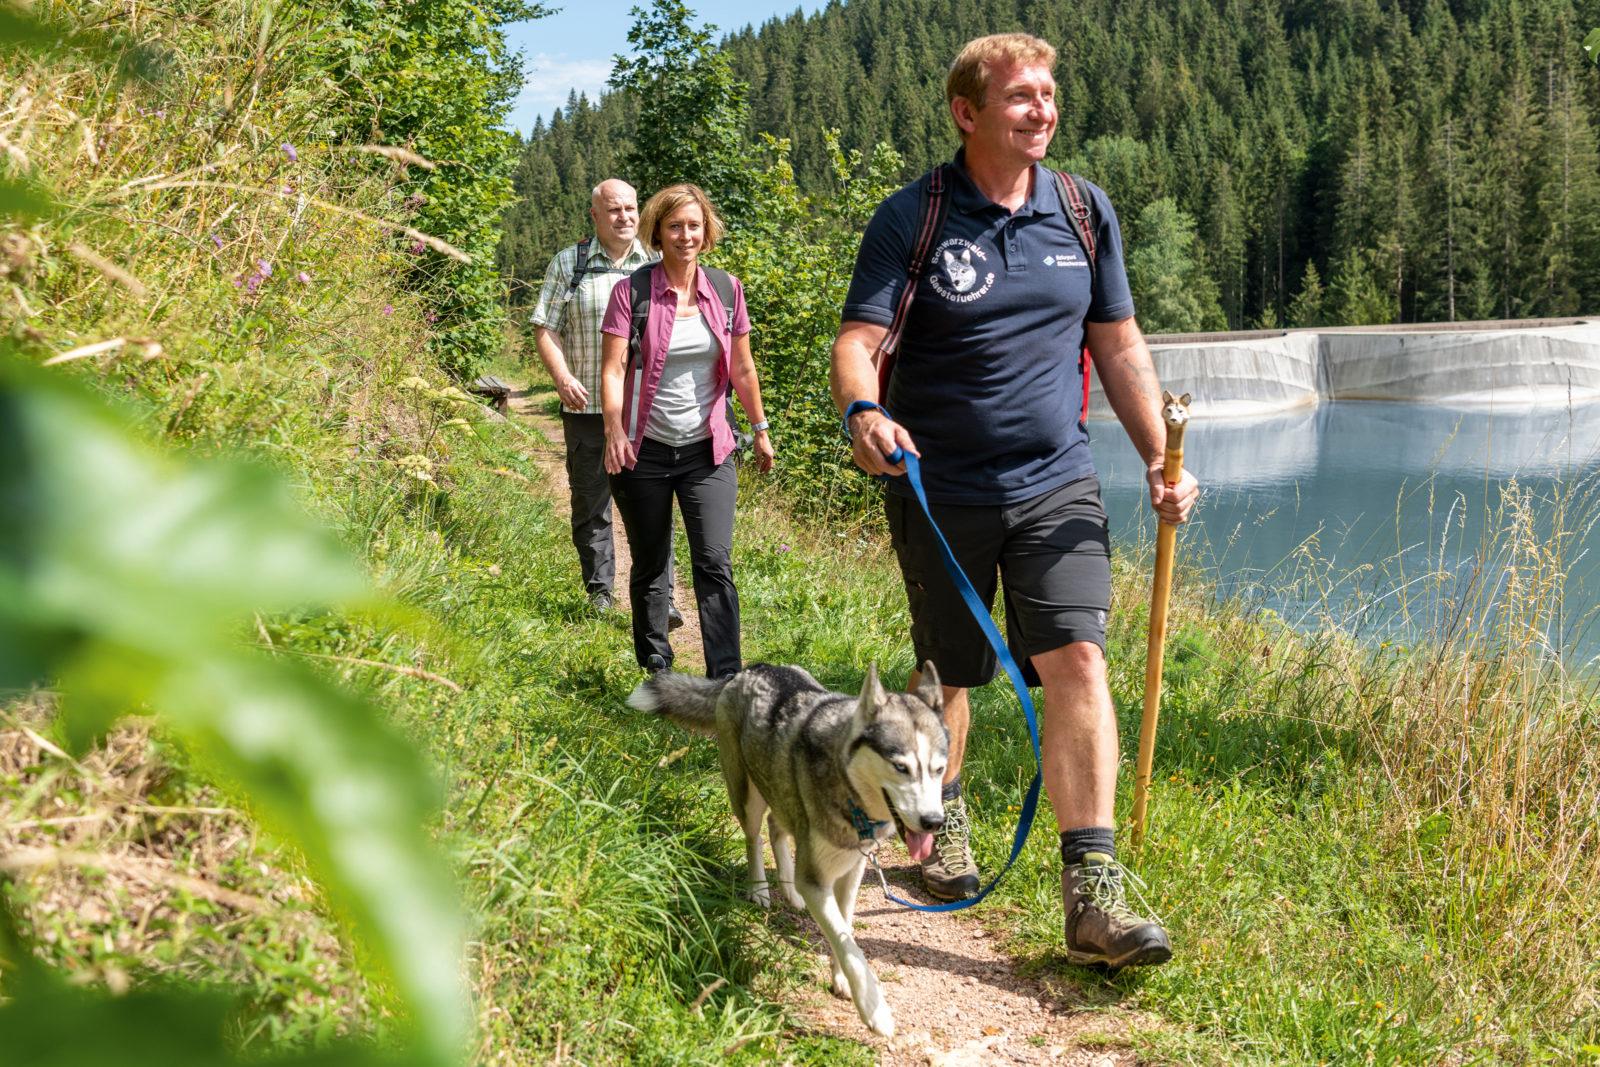 Vöhrenbach Linachtalsperre Wandern